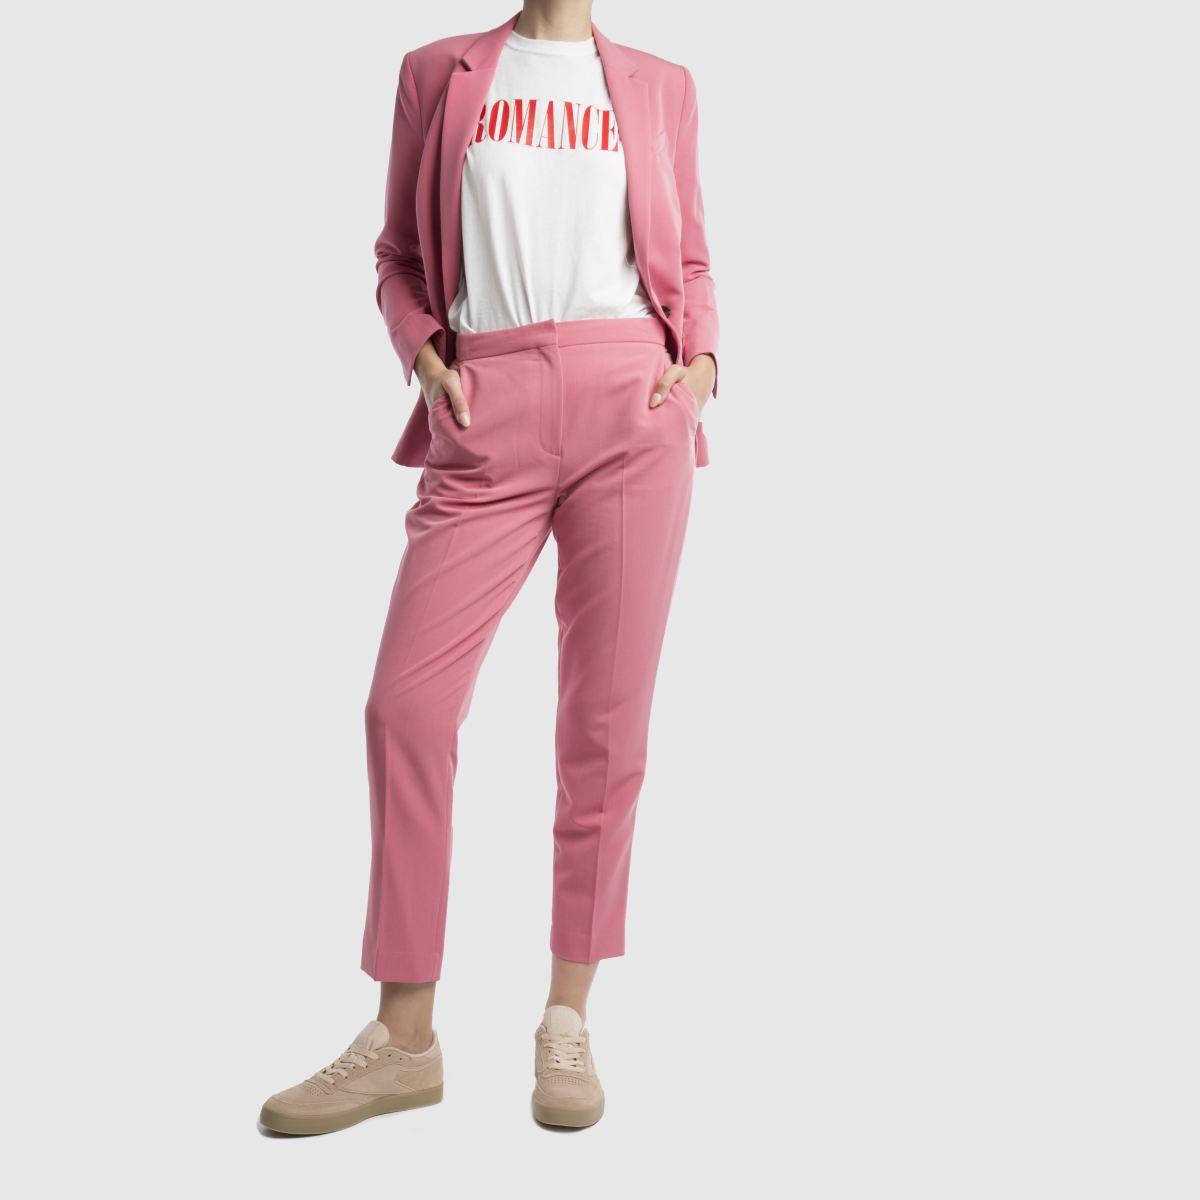 Damen Rosa reebok Club C 85 Fvs Gute Gum Sneaker | schuh Gute Fvs Qualität beliebte Schuhe 6c34f5